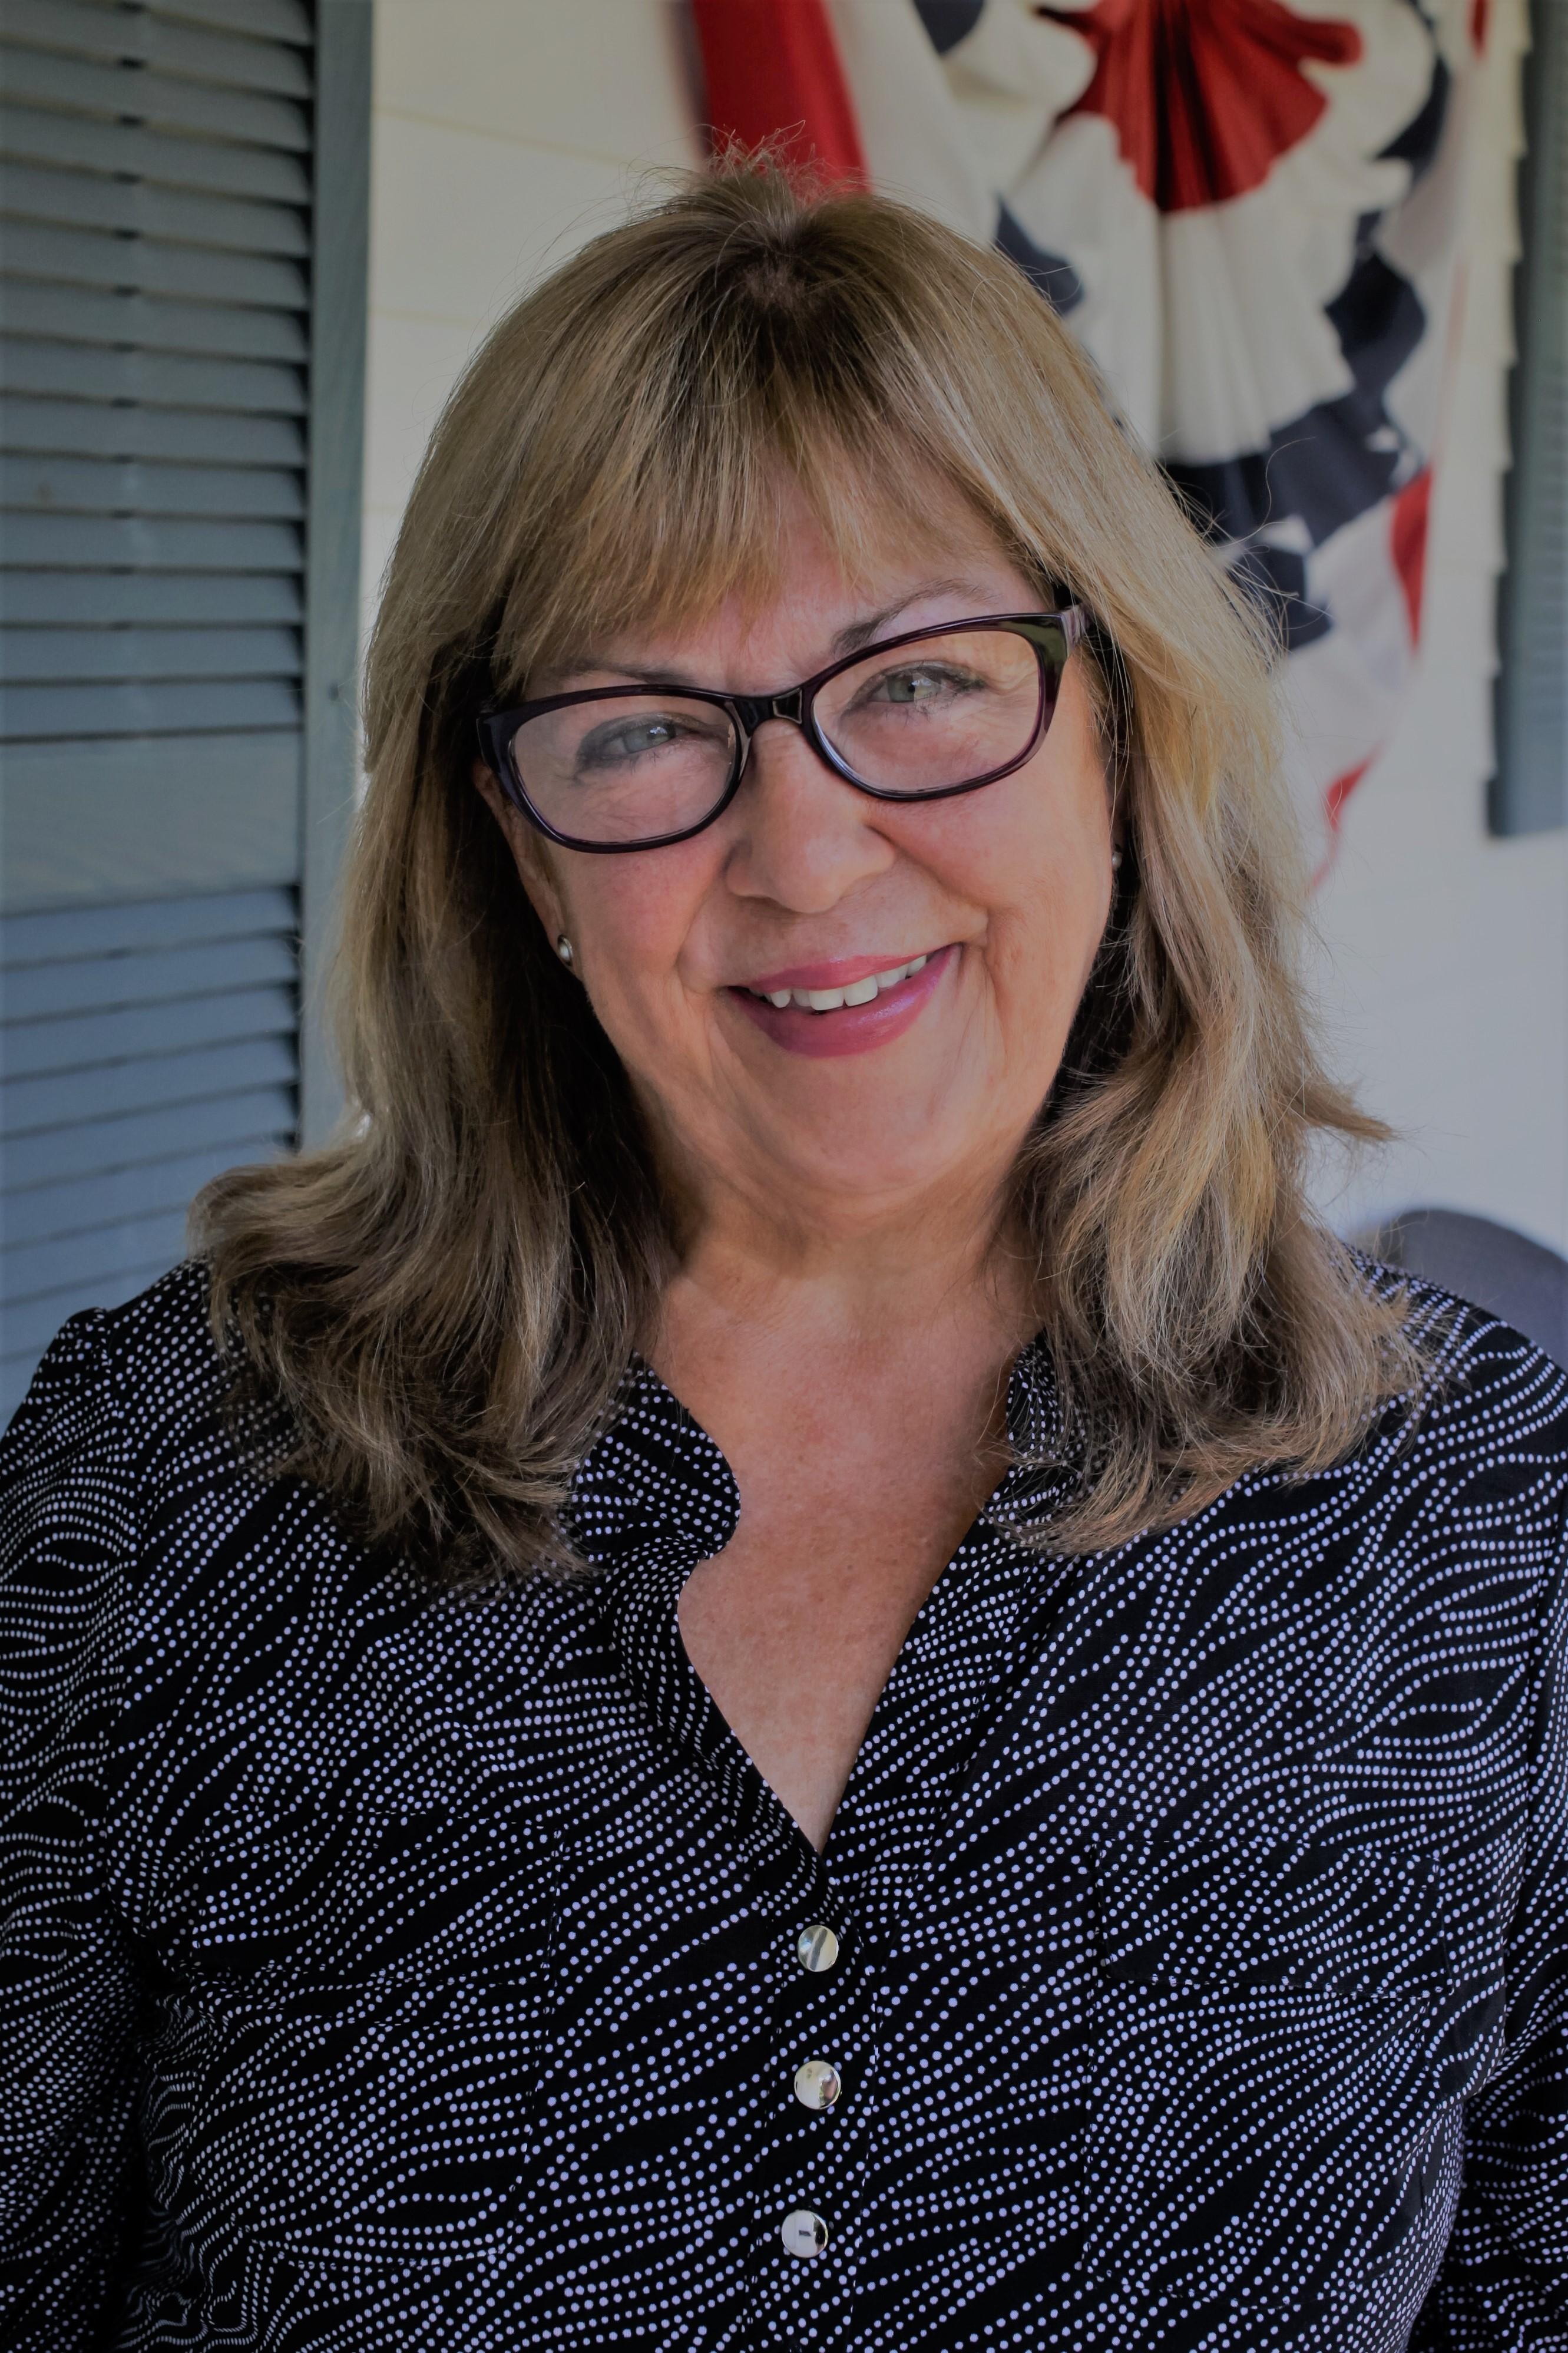 Barbara undefined Mullet